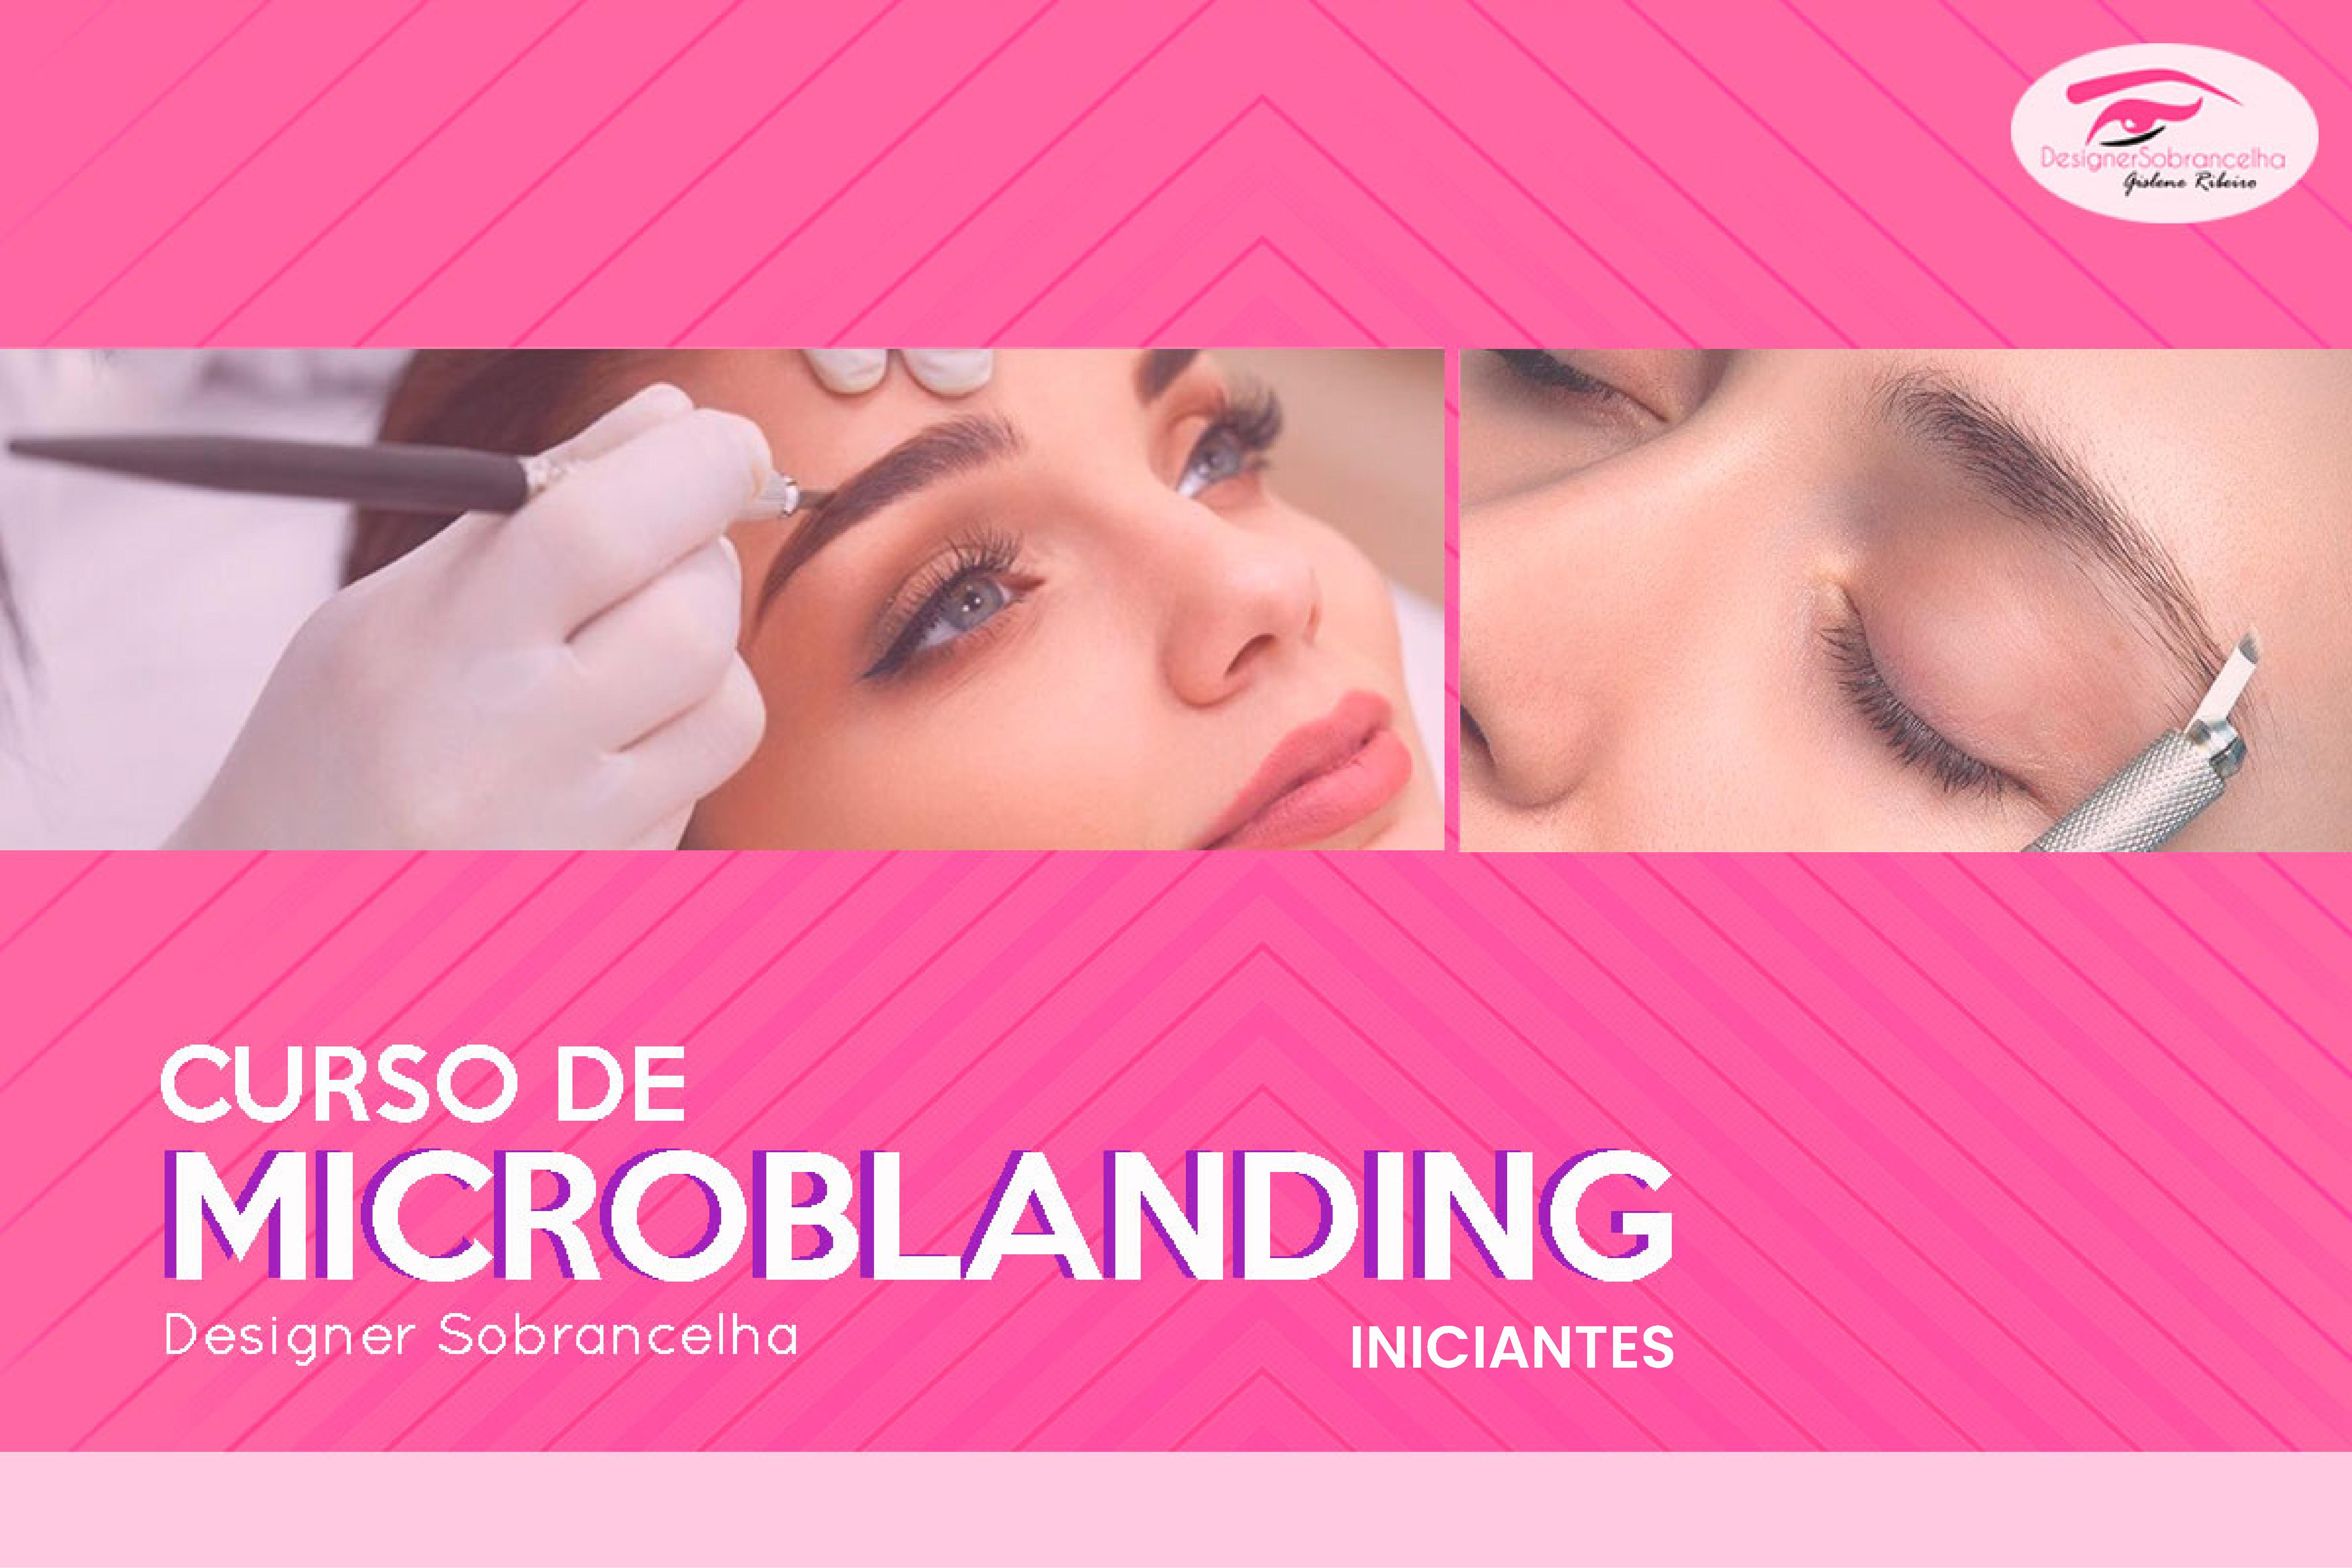 Microblading (Iniciantes)